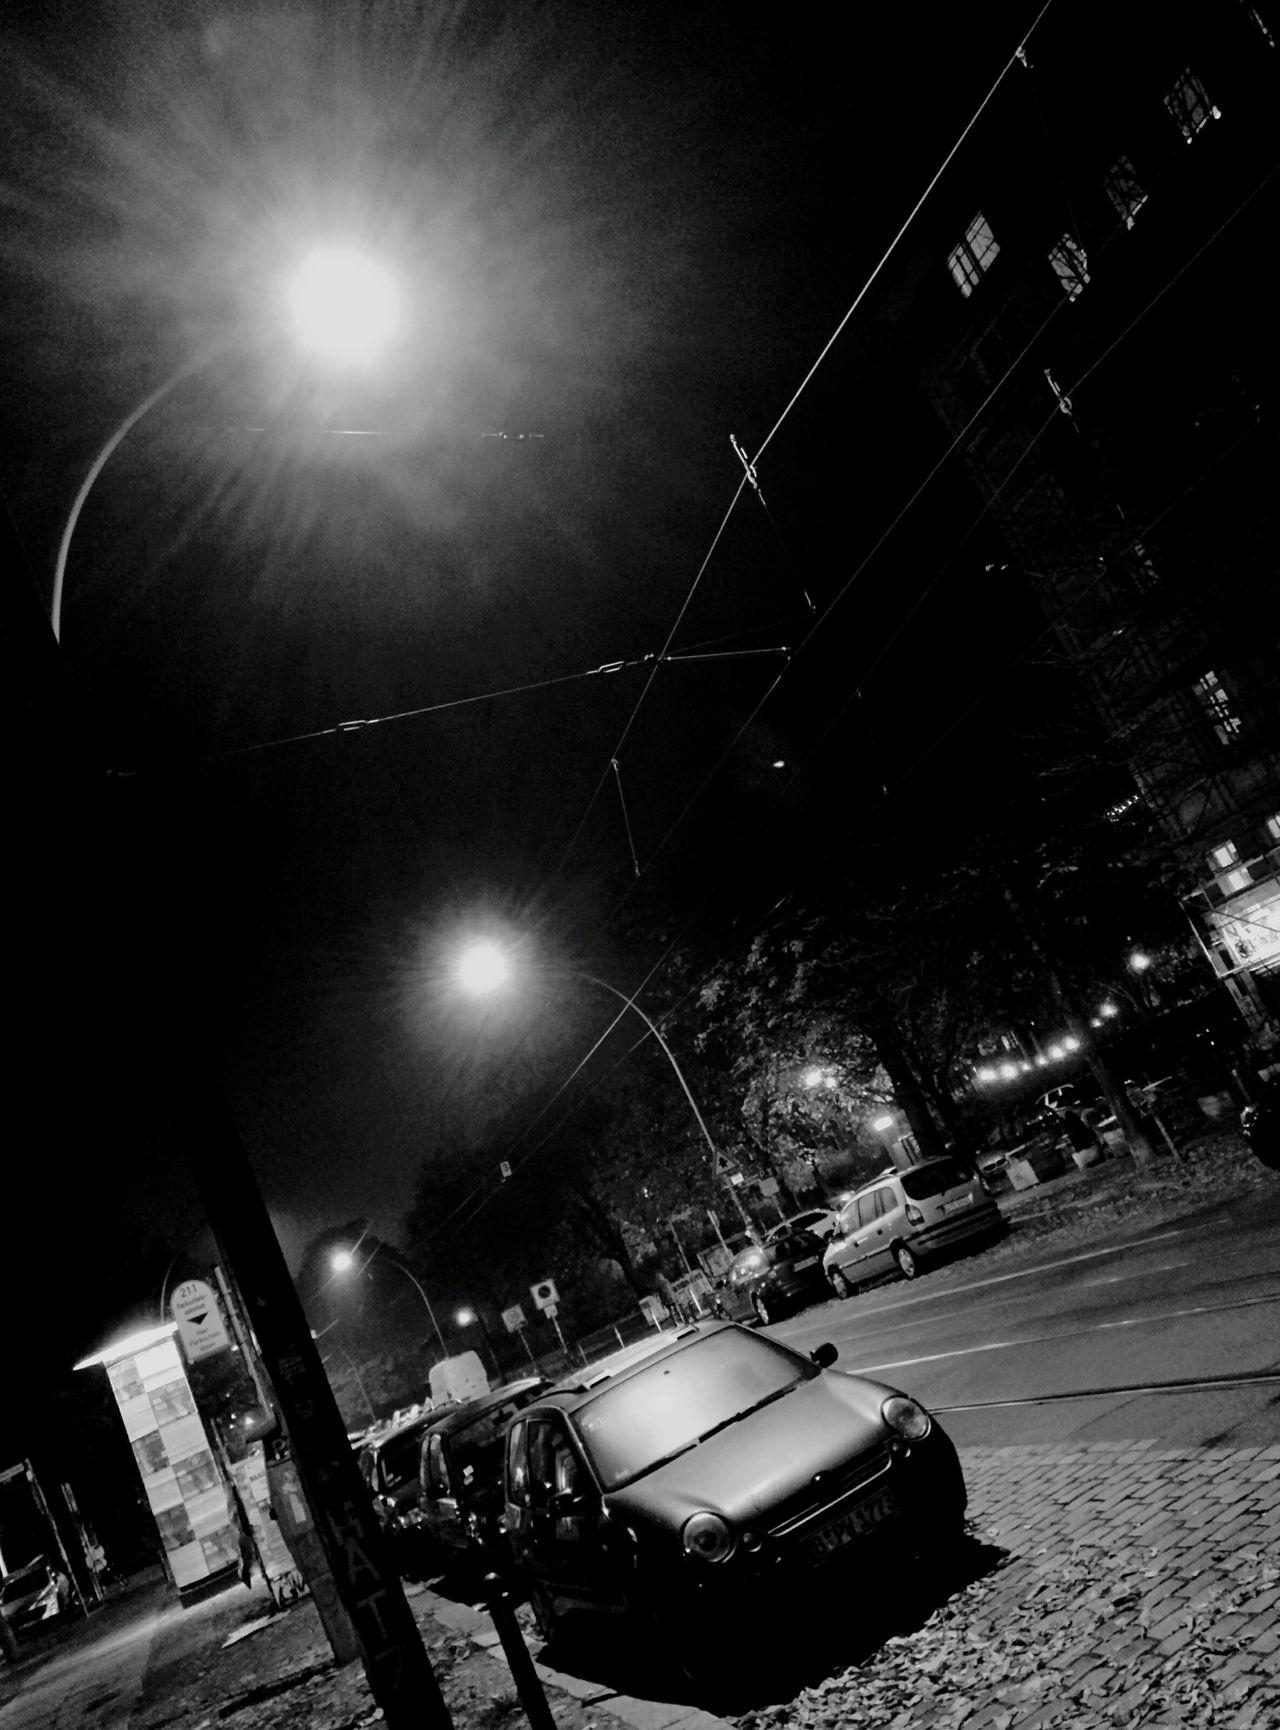 Day 129 - Street at night 🌃 Berlin Streetphotography Streetphoto_bw Blackandwhite Street 365project 365florianmski Day129